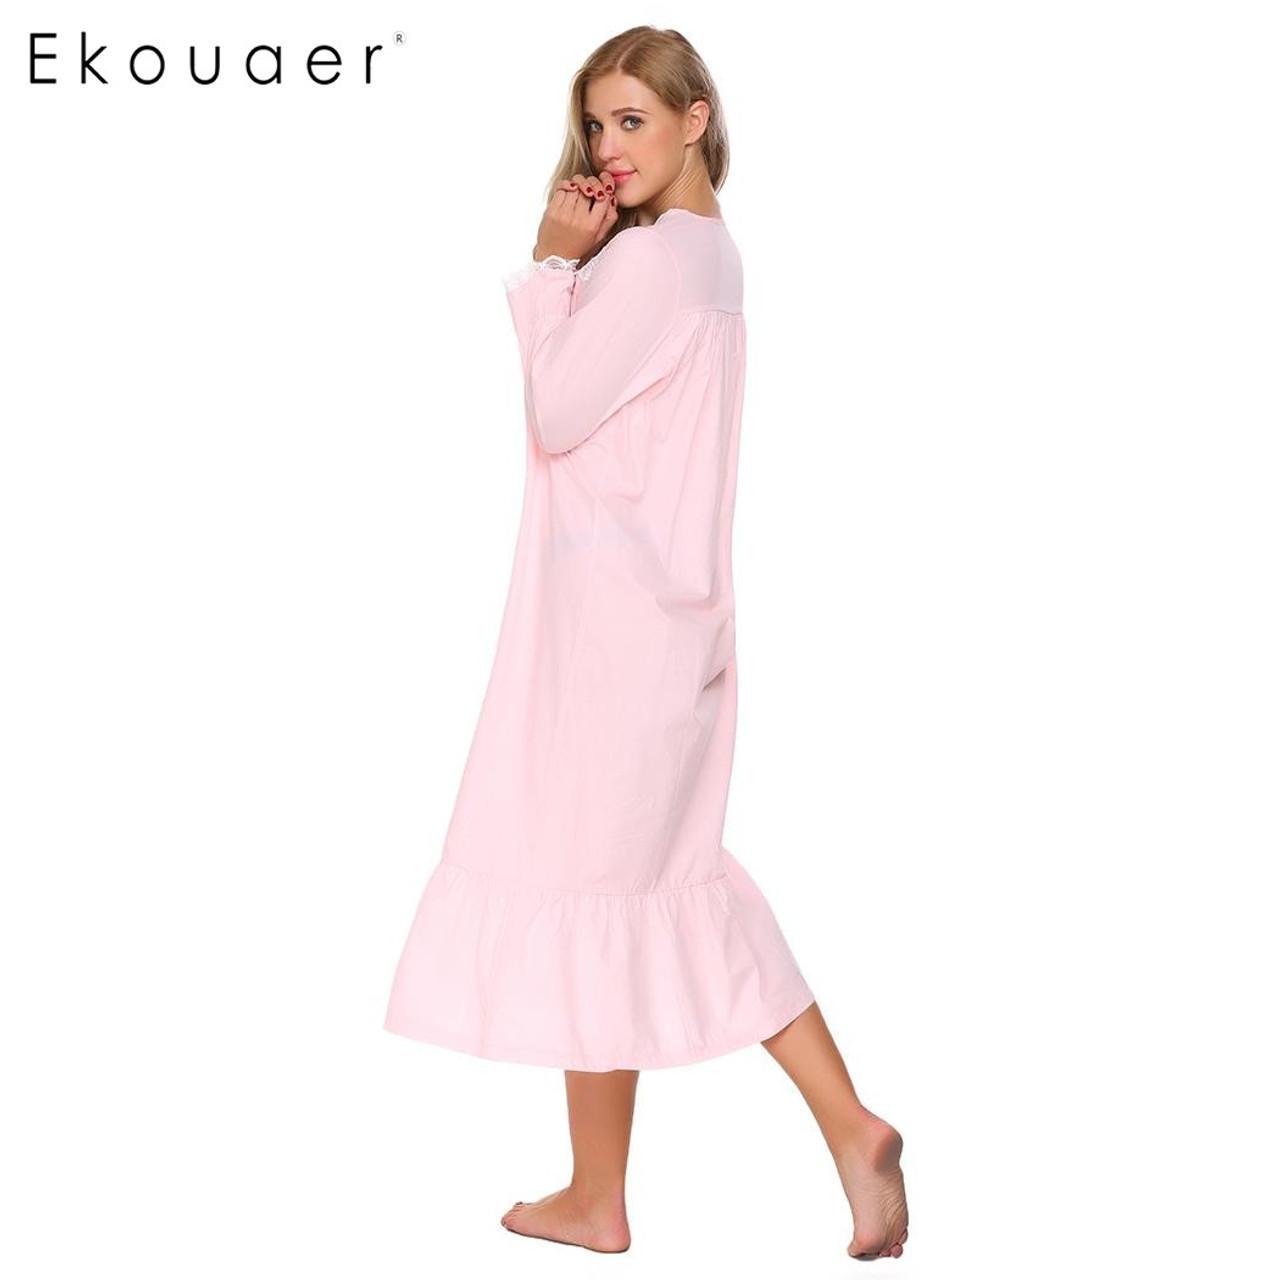 ... Ekouaer Elegant Solid Nightwear Womens Victorian Long Sleeve Sleepwear  Lace Patchwork Ruffled Hem Nightgown Plus Size ... bc1a7d8c1